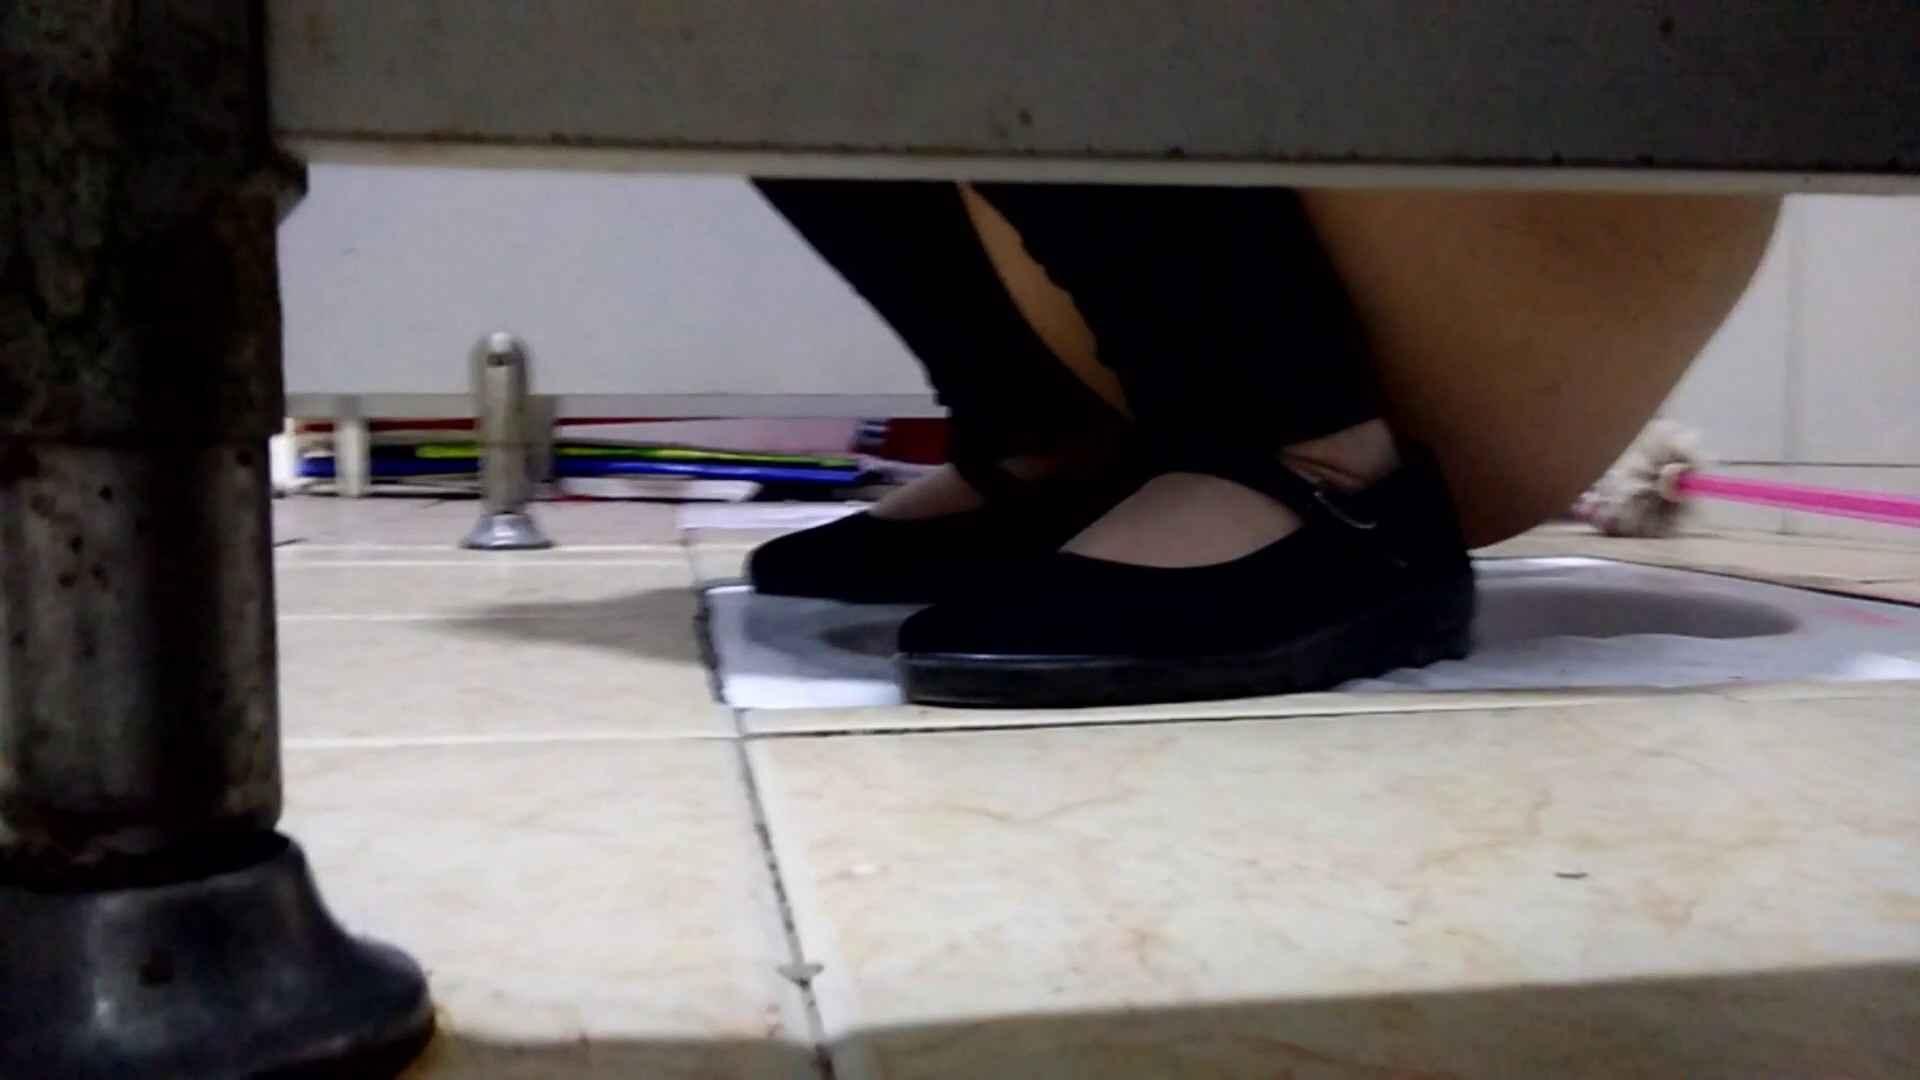 芸術大学ガチ潜入盗撮 JD盗撮 美女の洗面所の秘密 Vol.105 潜入 エロ画像 68画像 23